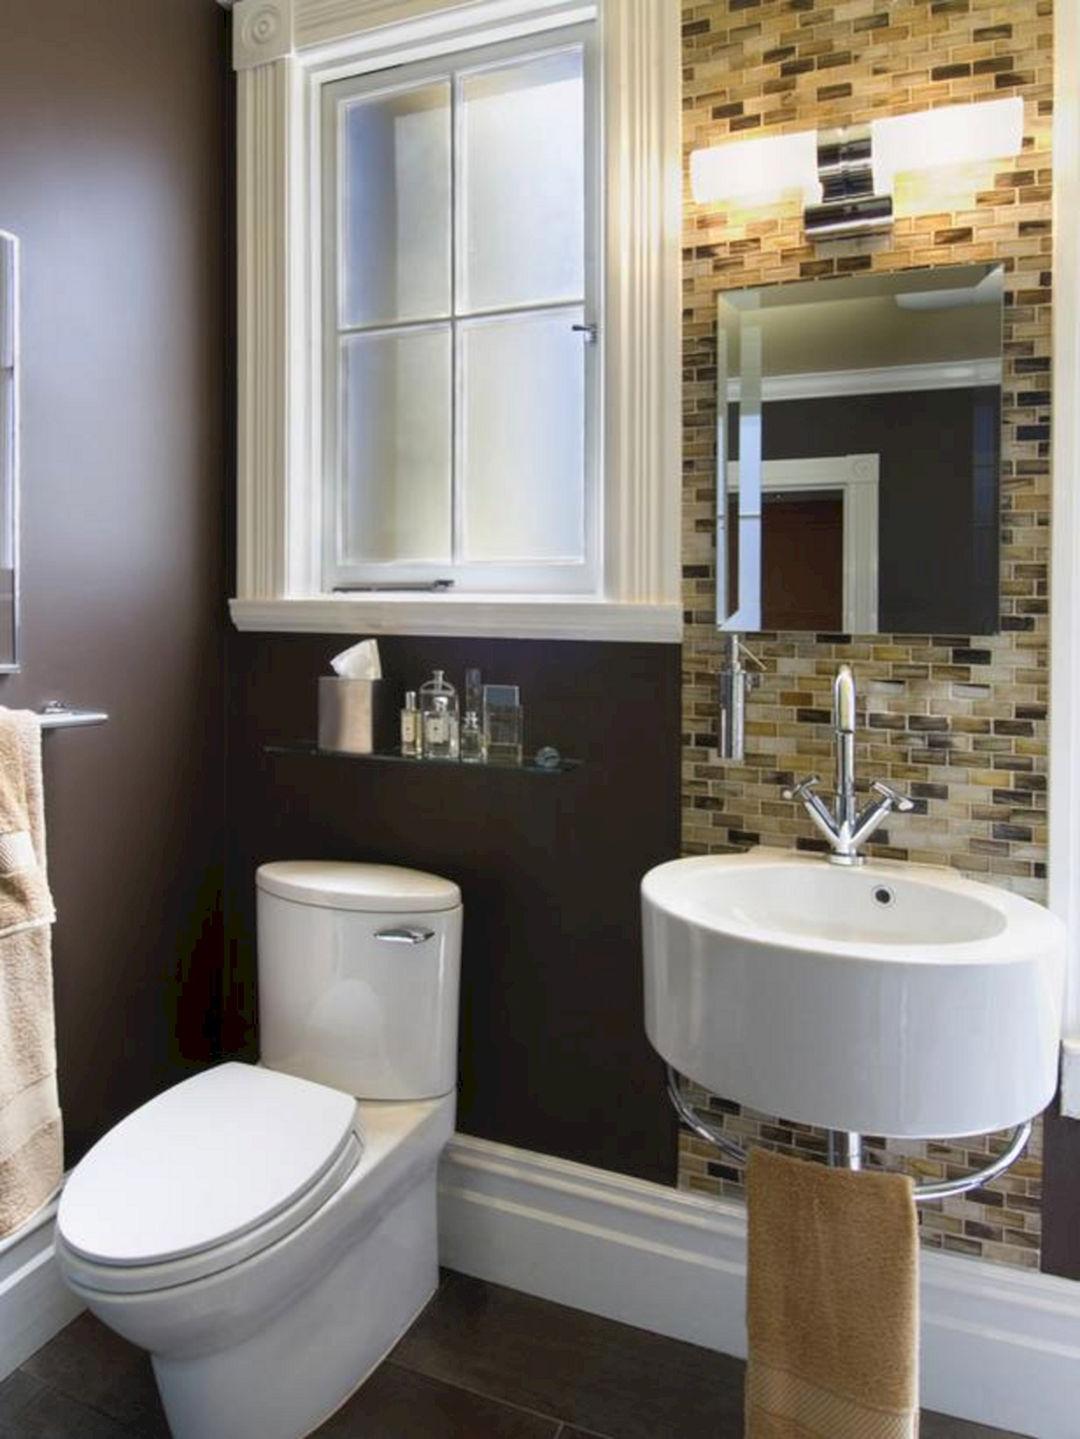 Hgtv Small Bathroom Design Ideas Hgtv Small Bathroom